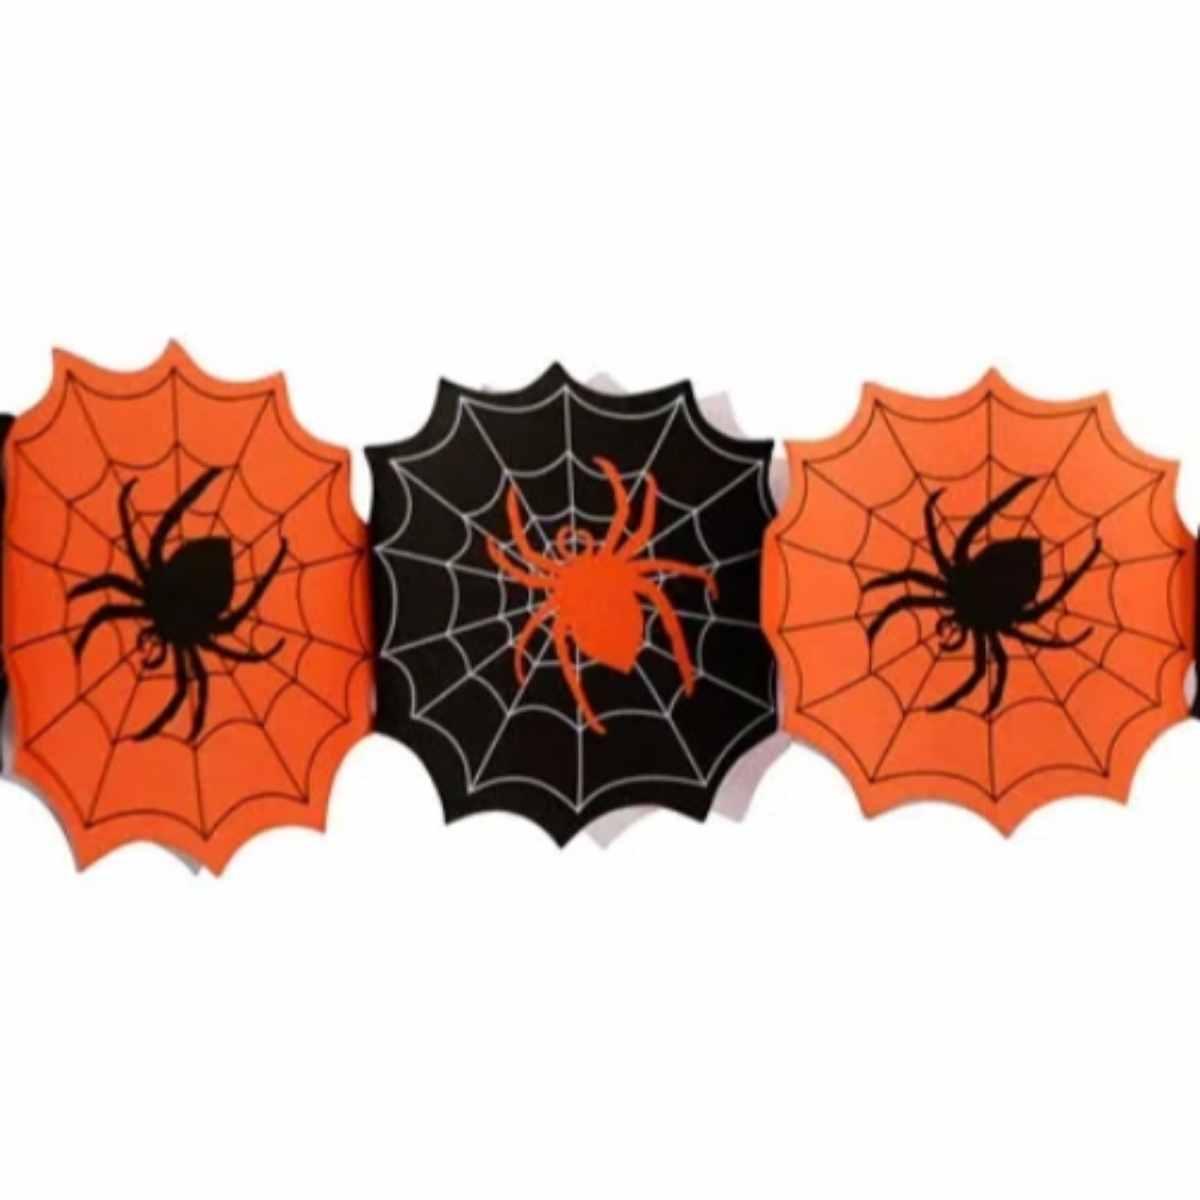 Guirlanda Halloween Aranhas 2.4m